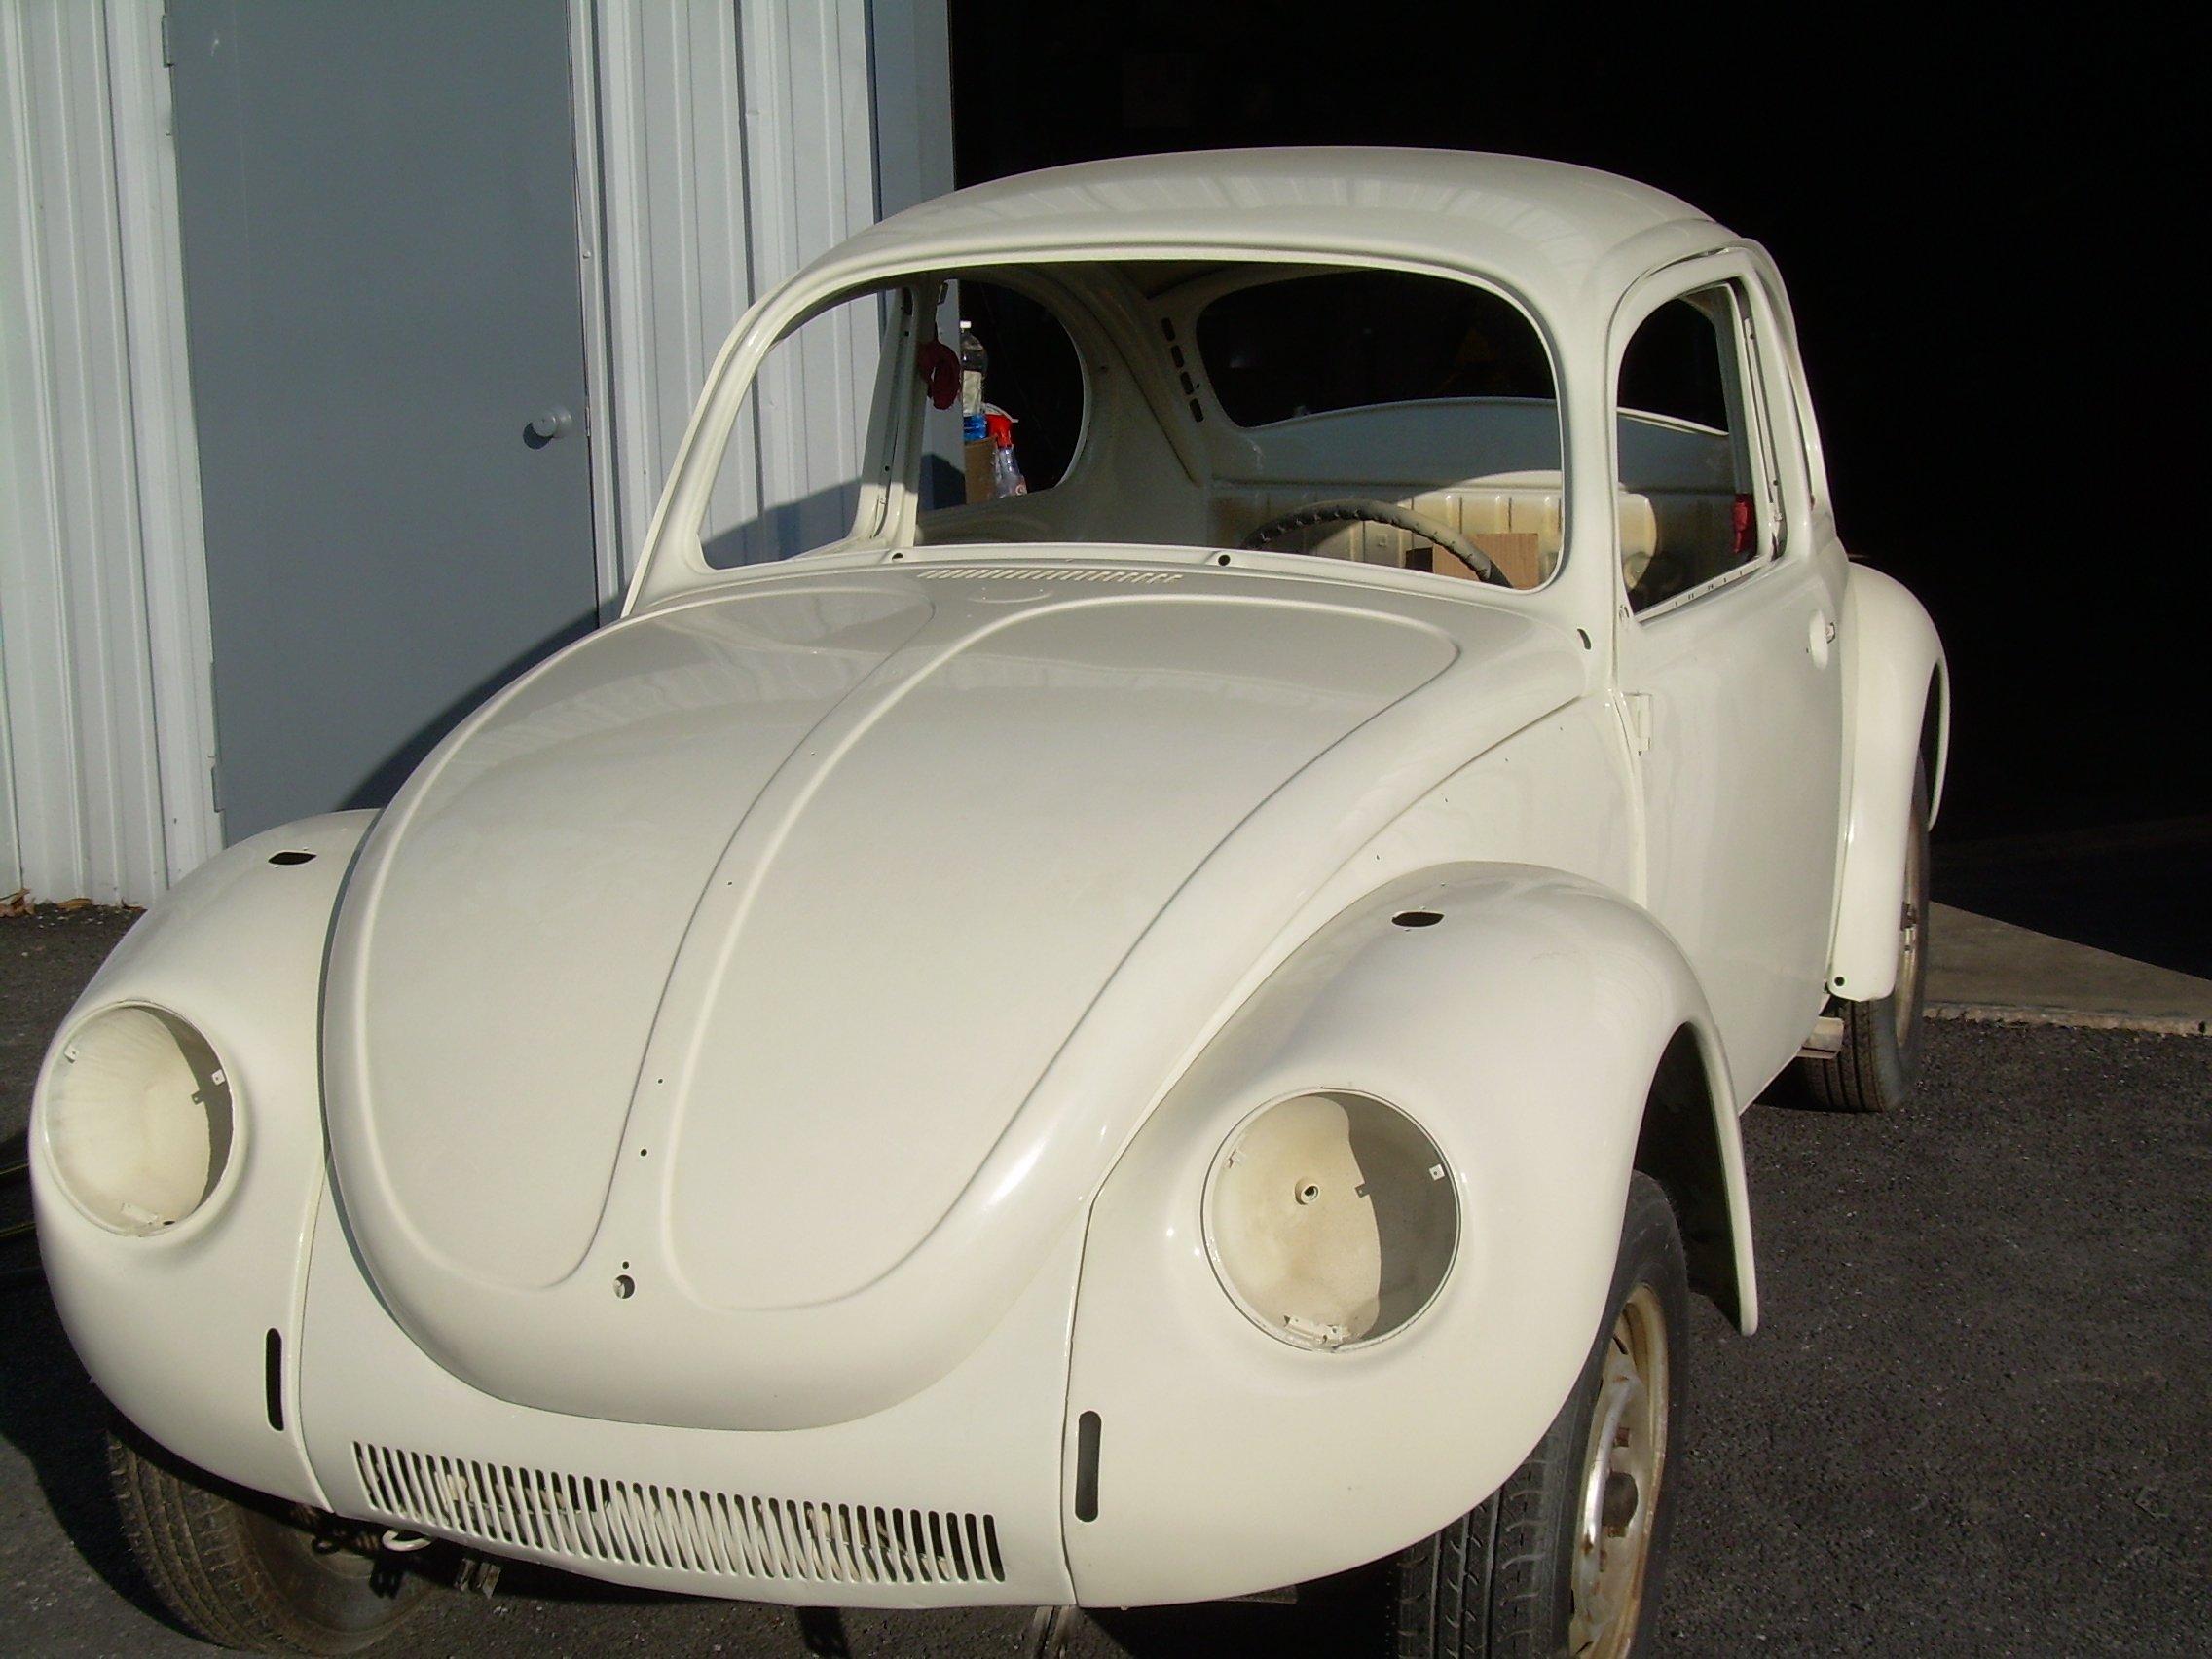 volkswagen playa pin vw evento de wagen beetle ensenada los bos hermosa beetles pinterest craigslist and